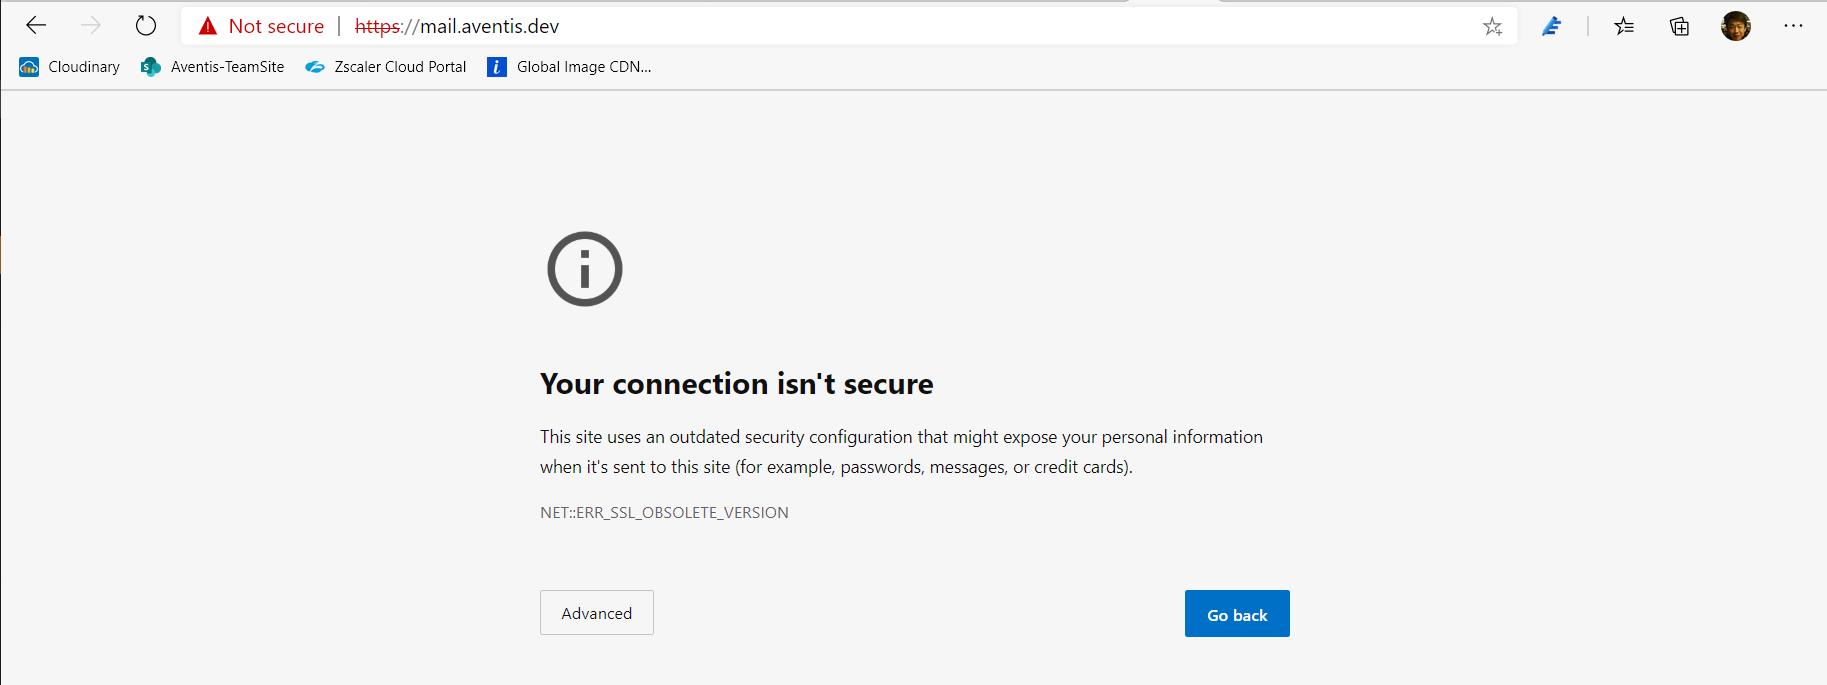 Enable TLS 1.2 in Exchange 2010